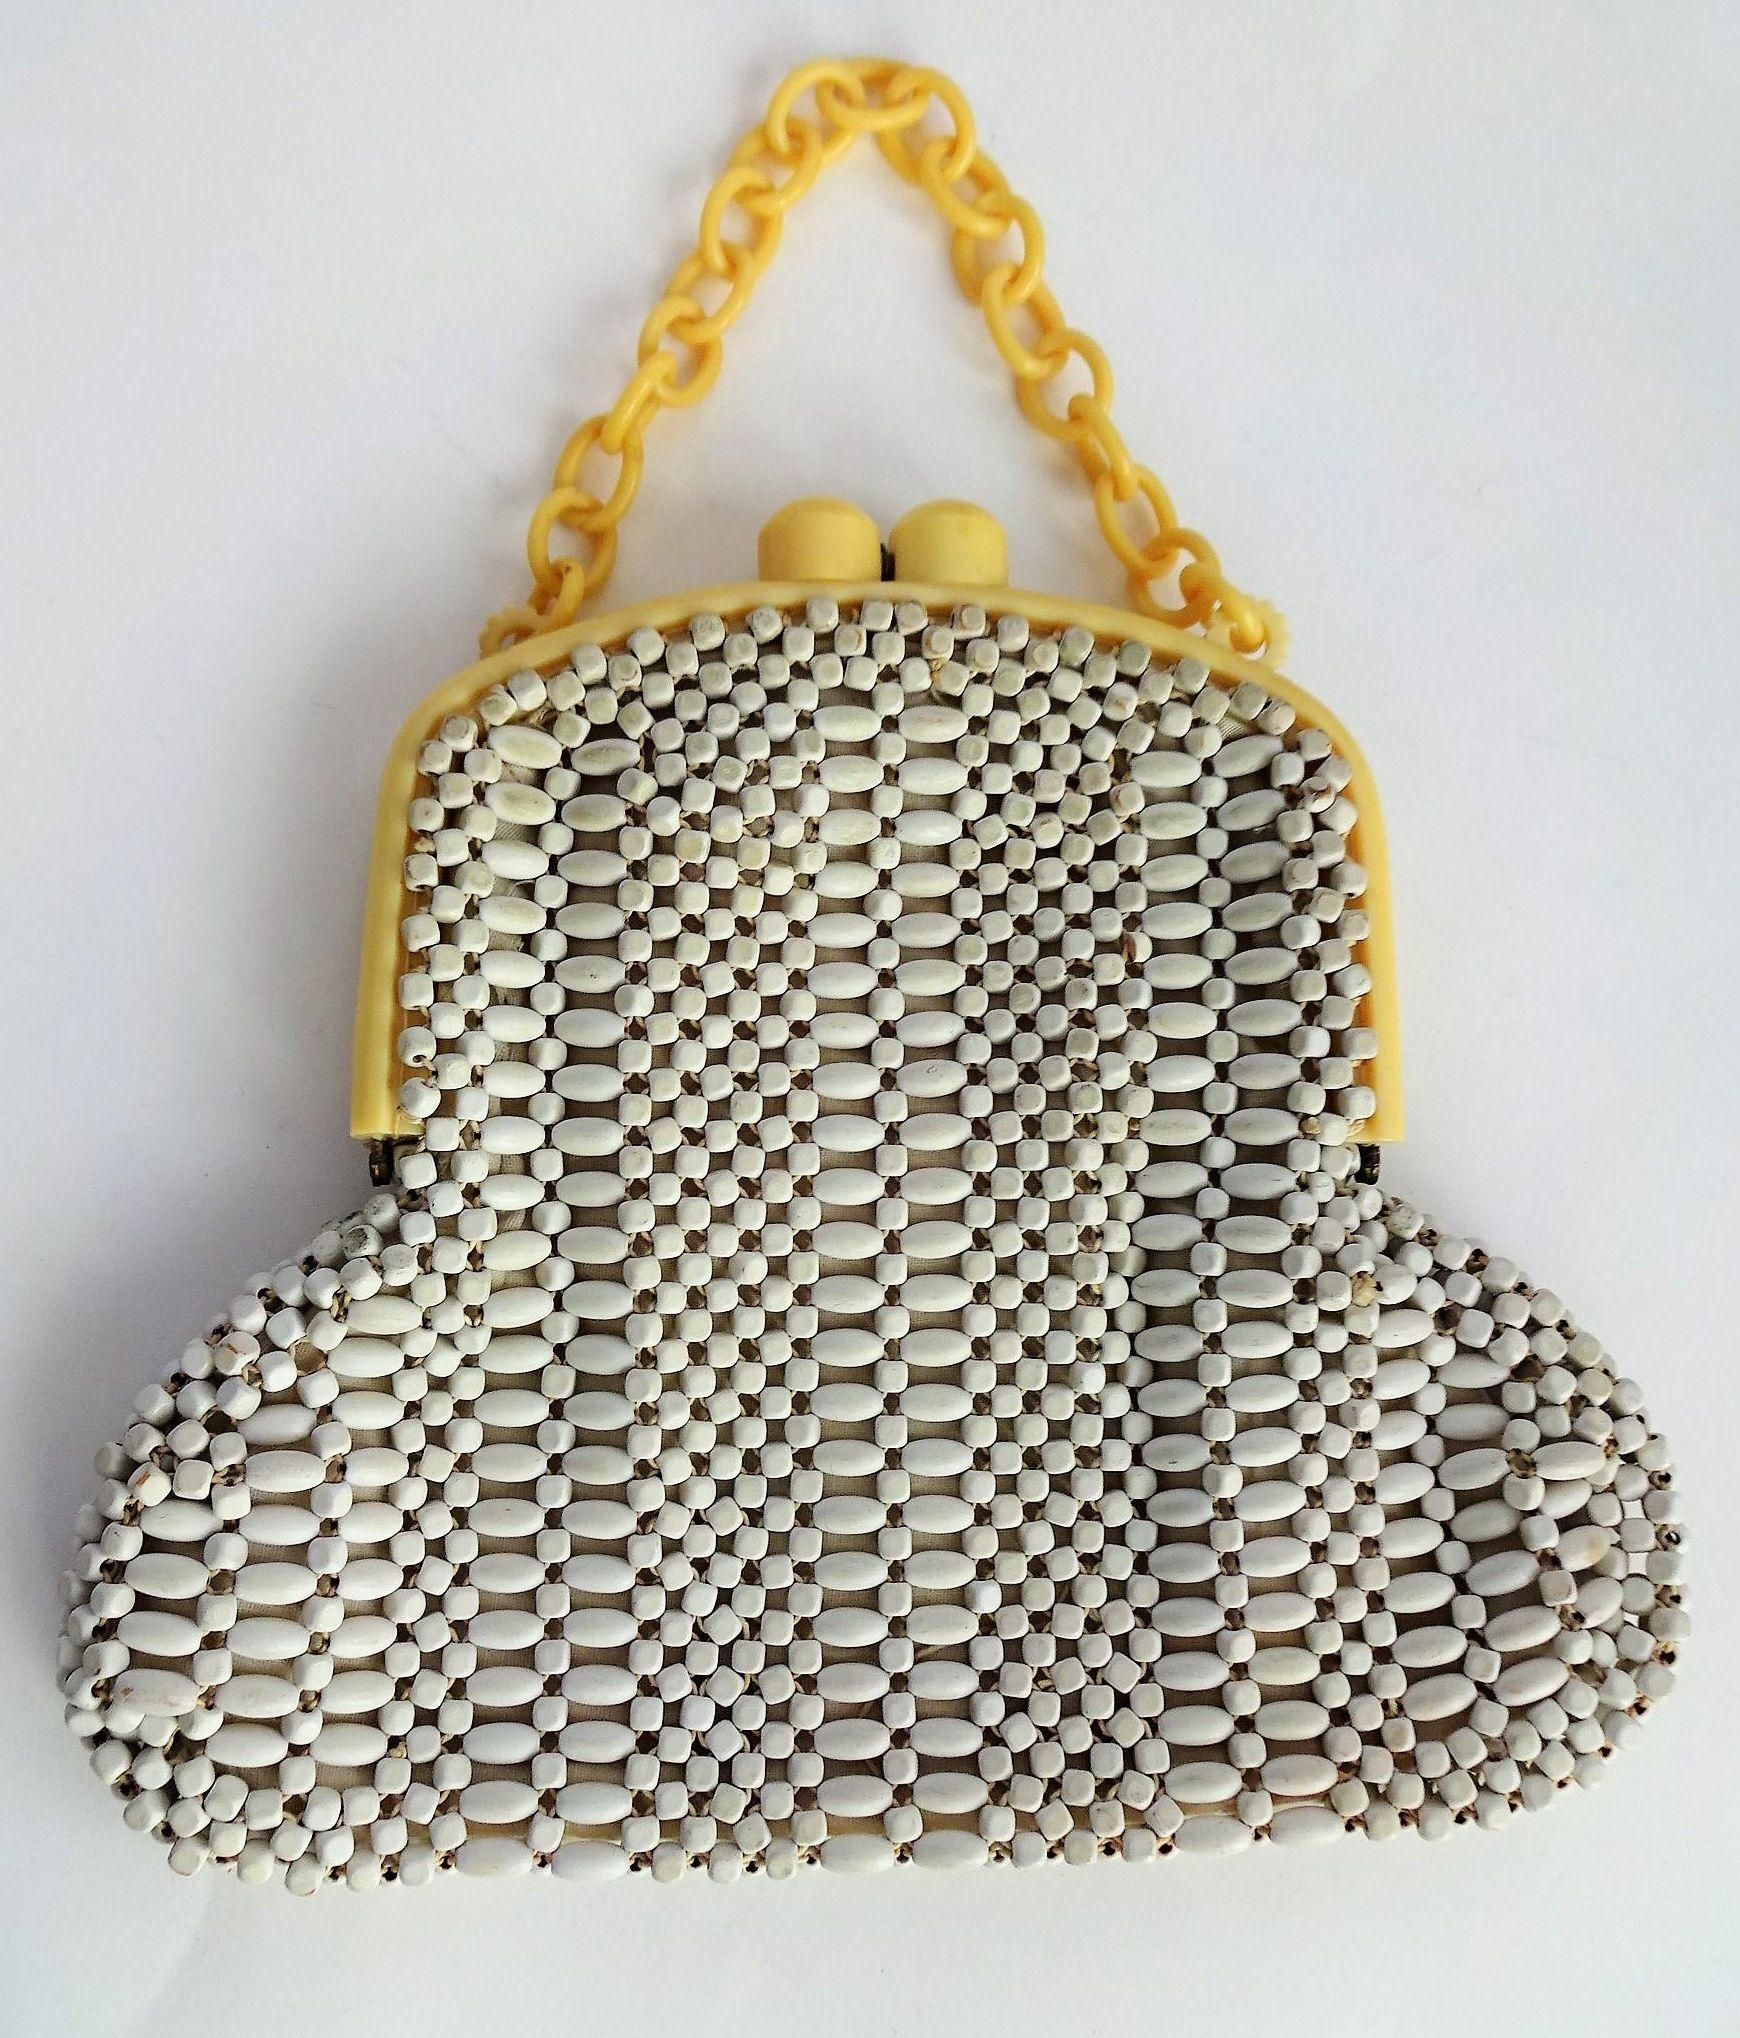 Art Deco Celluloid Beaded Purse Vintage 1940s White Yellow Womens ... e422d148dc31e